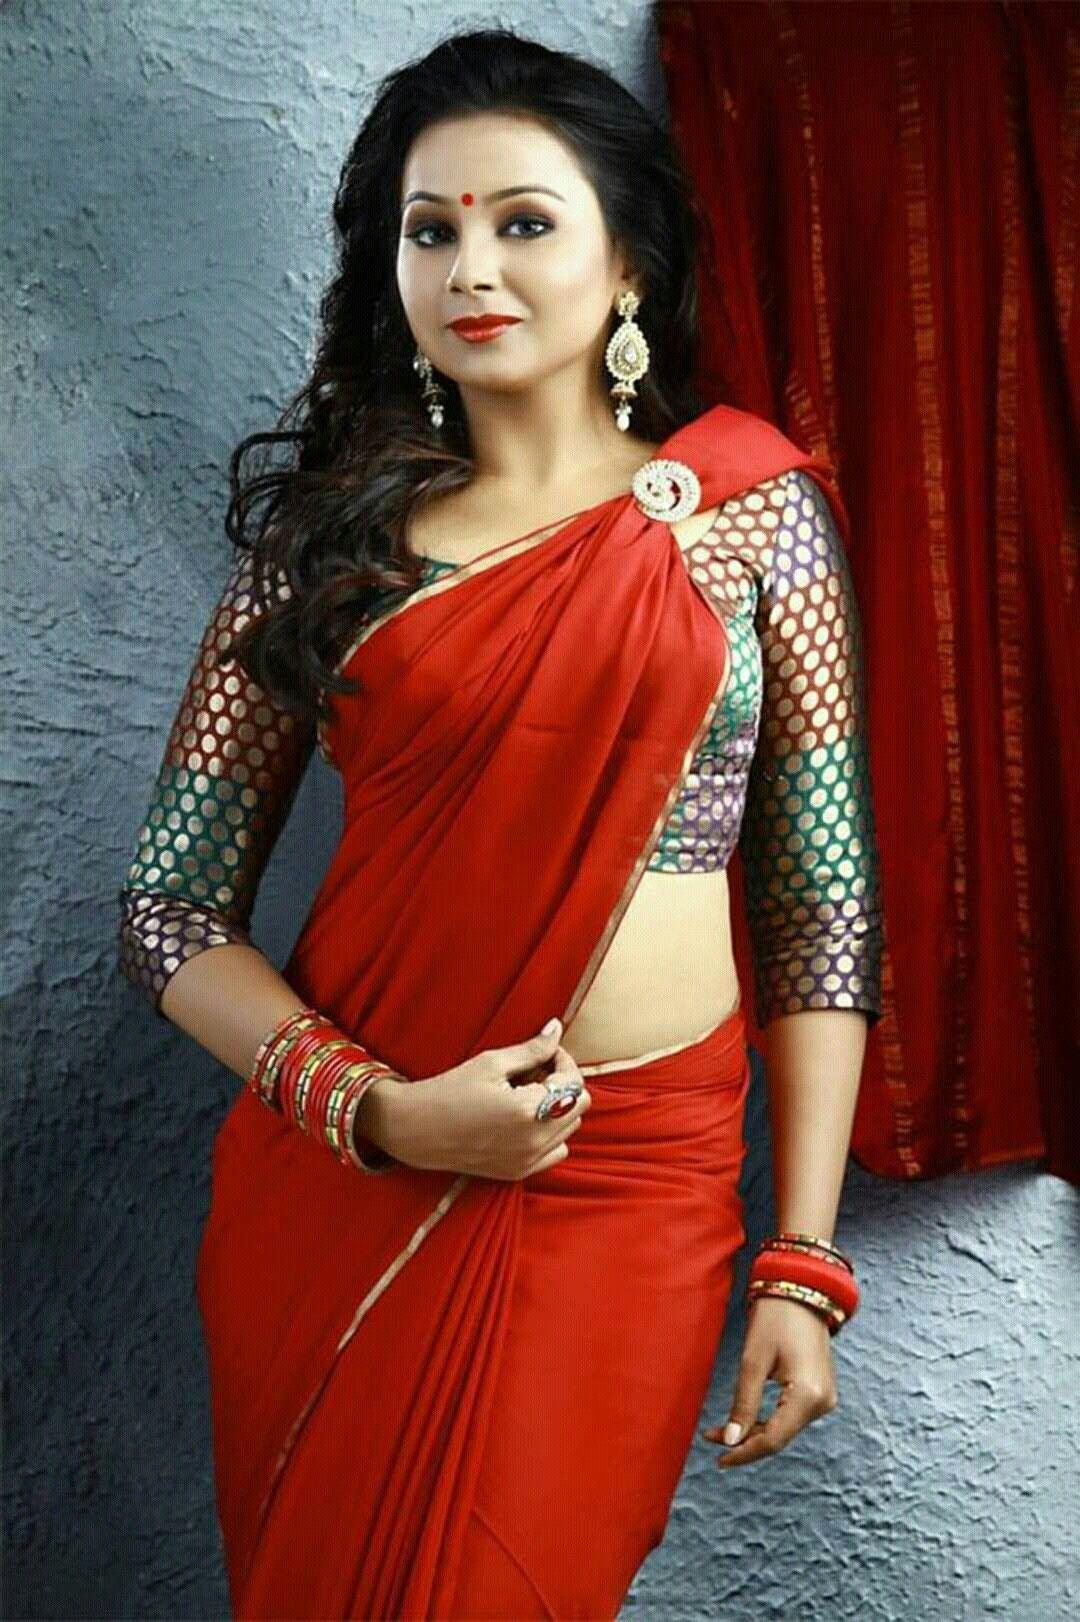 Pin by Srinivasan J on Beauty Saree, Saree photoshoot